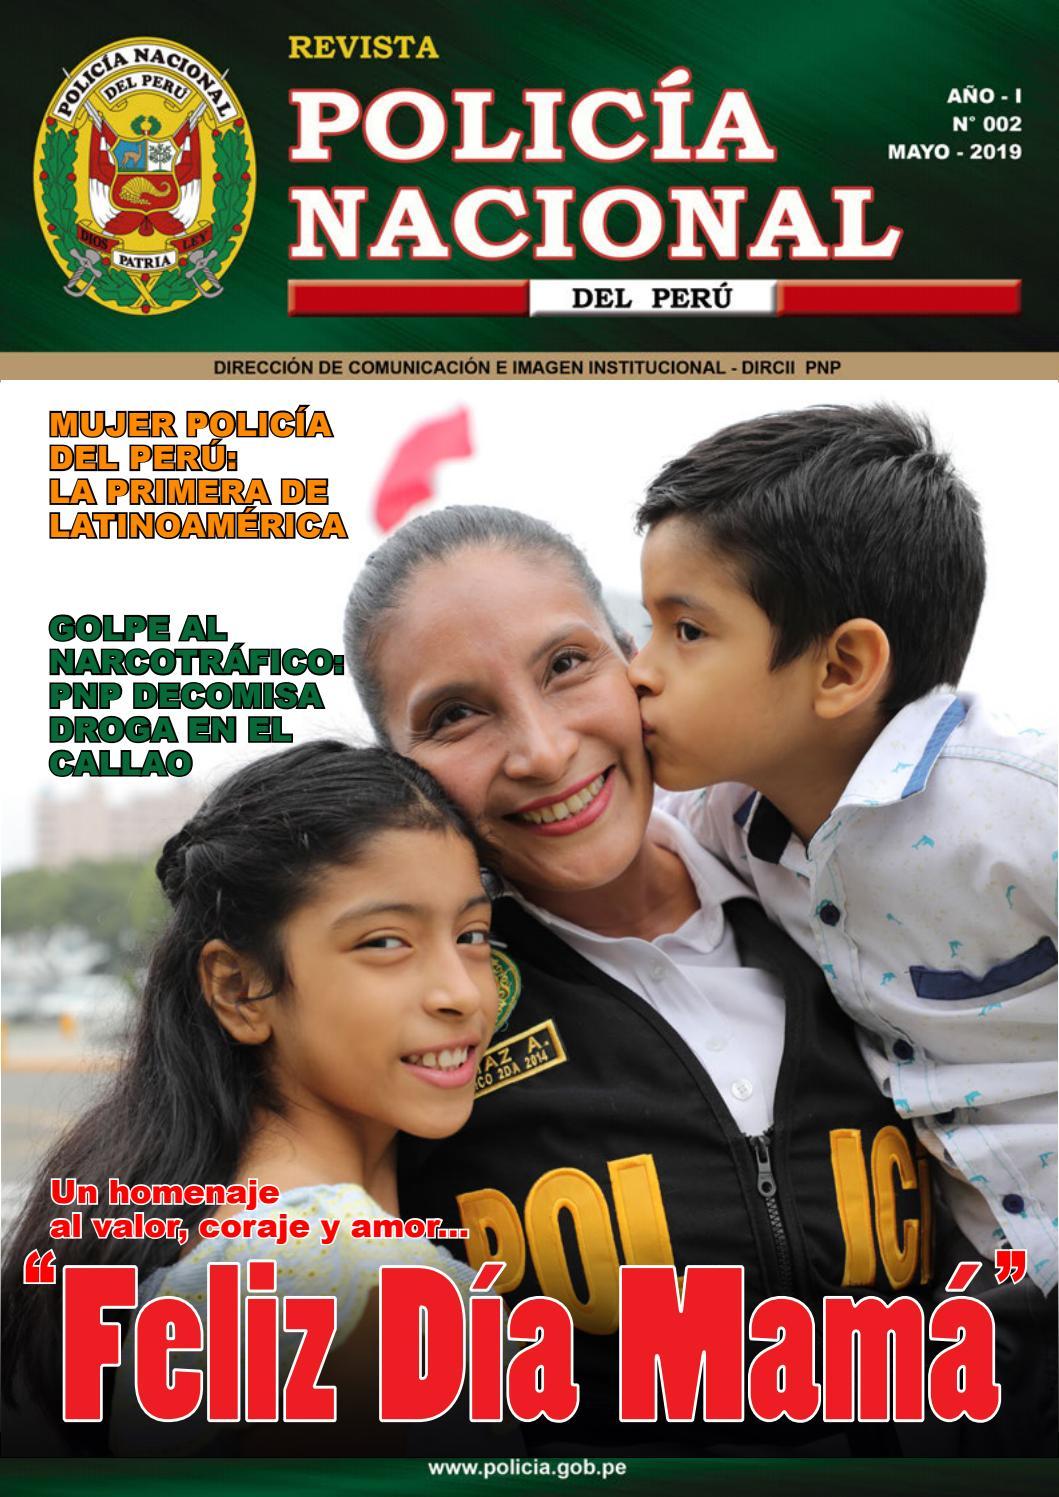 Revista Pnp Edicionº 2 By Policia Nacional Del Peru Issuu — policía peruana (@policiaperu) 2 de mayo de 2019. revista pnp edicionº 2 by policia